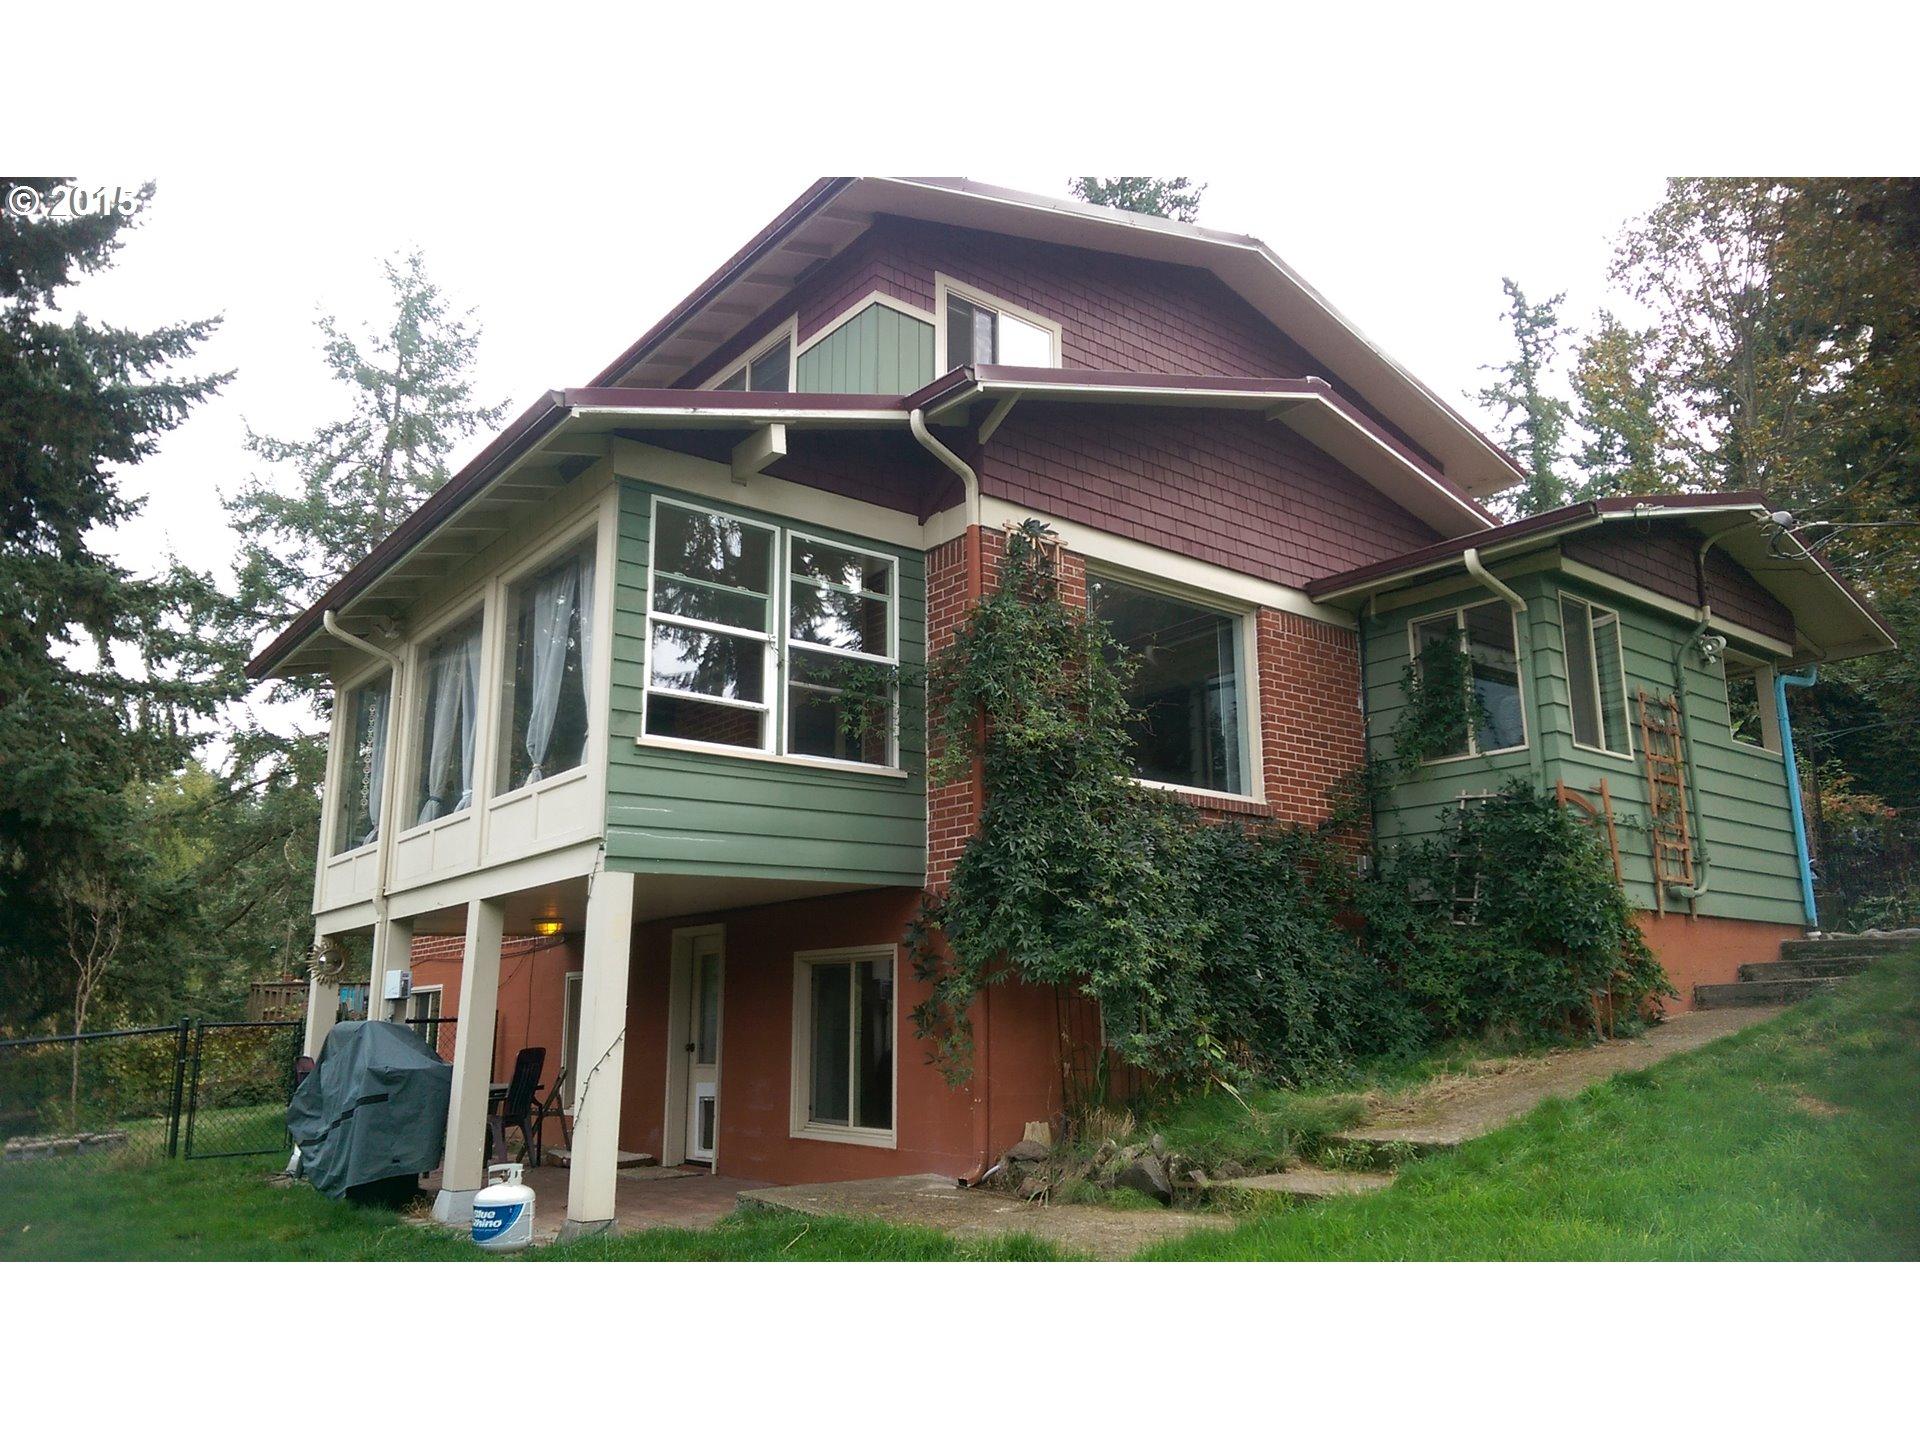 1151 LORANE HWY, Eugene OR 97405